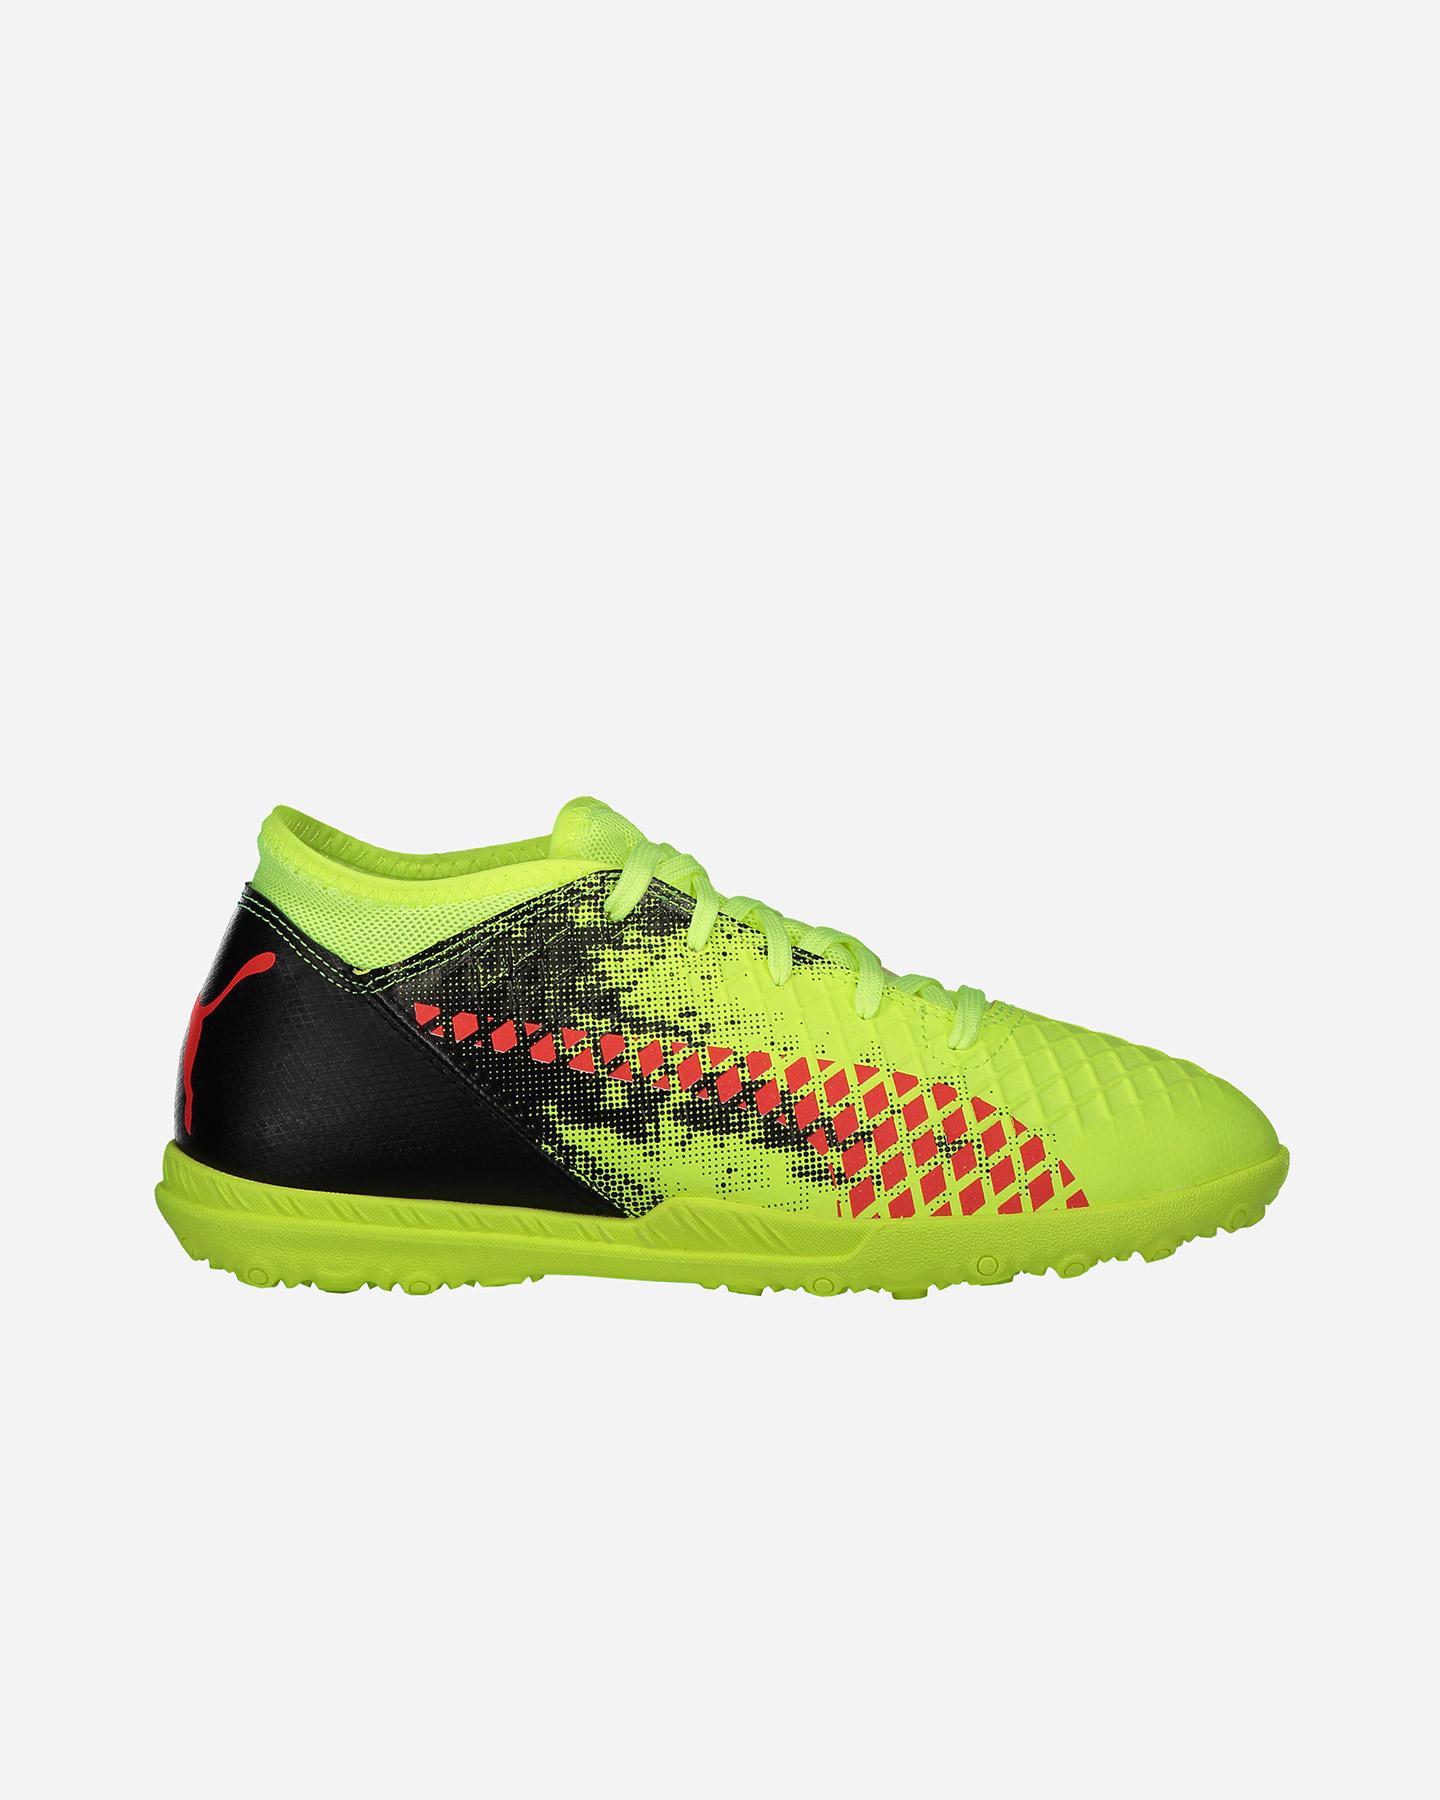 Future Tt 18 001 Sport Jr Su Scarpe Calcio 104351 4 Cisalfa Puma HZdqd